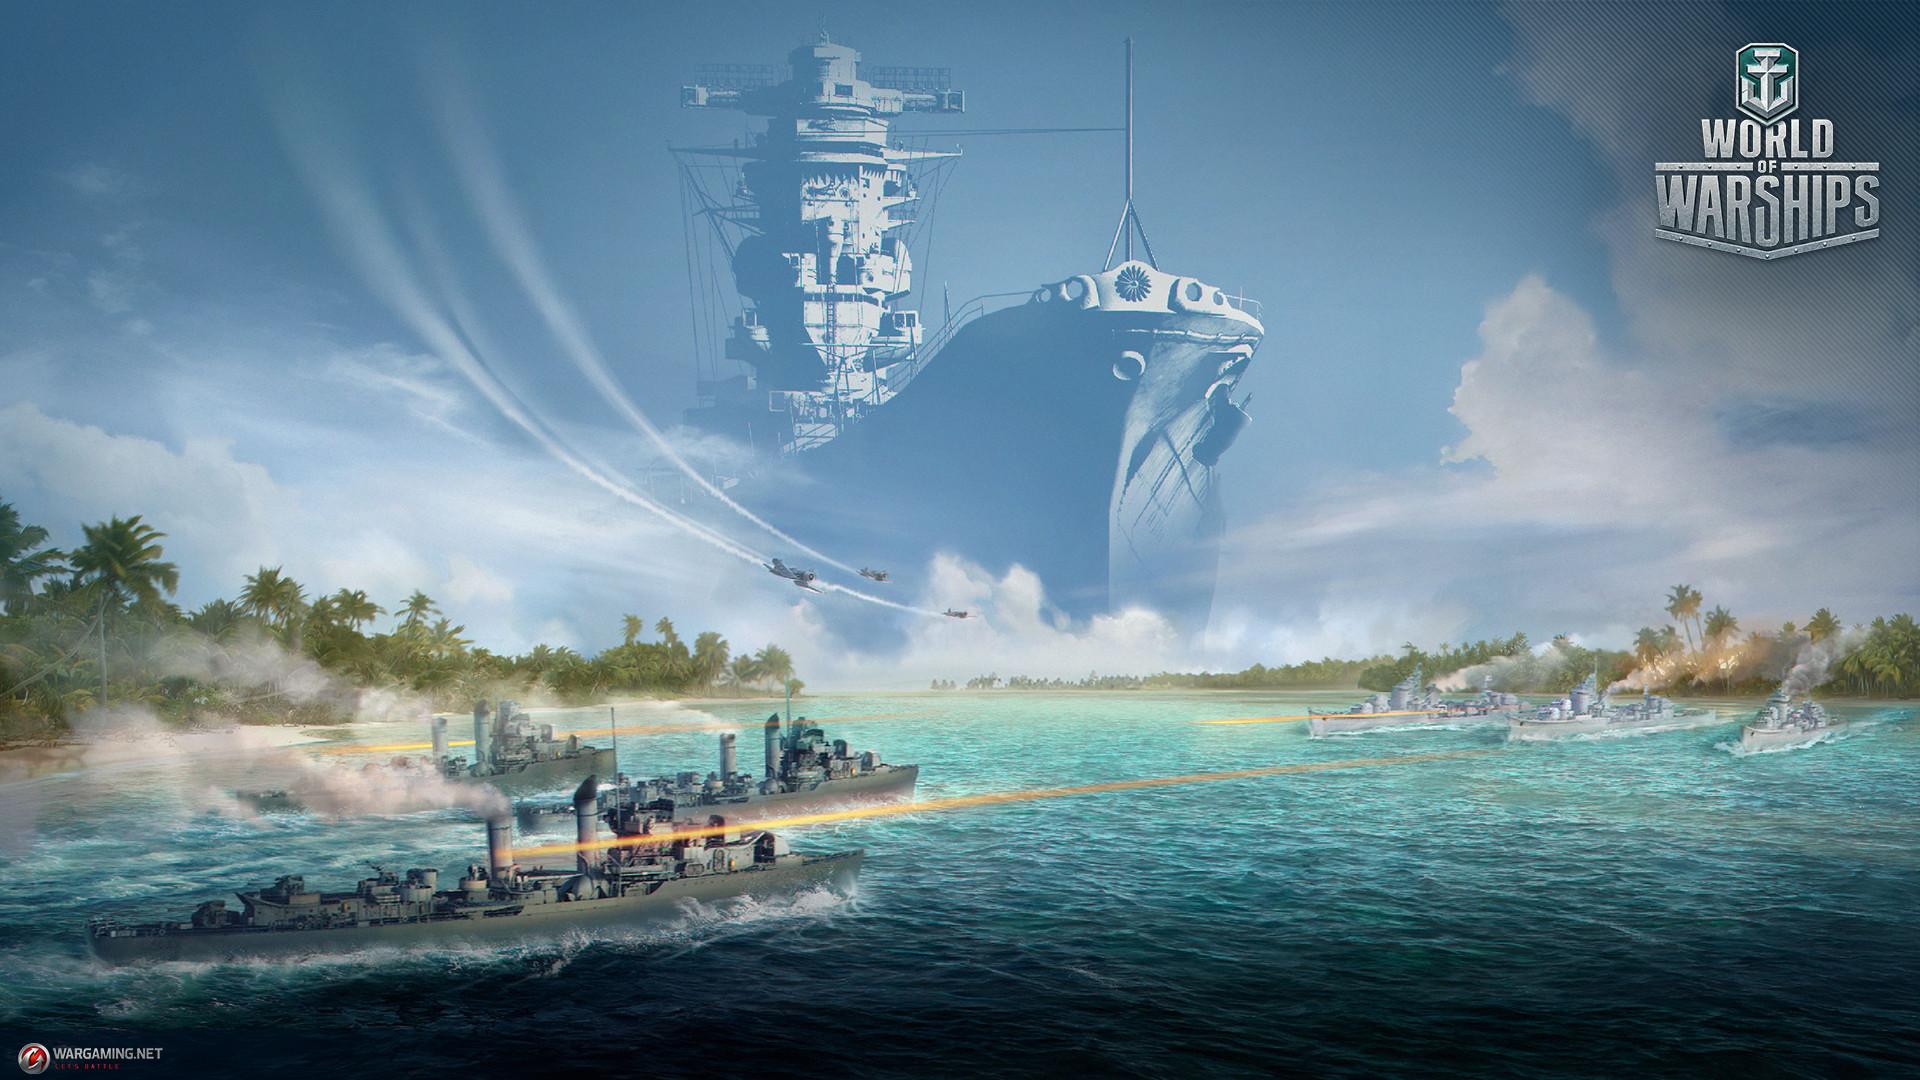 World Of Warships Wallpaper: World Of Warships Wallpaper 1920x1080 (83+ Images